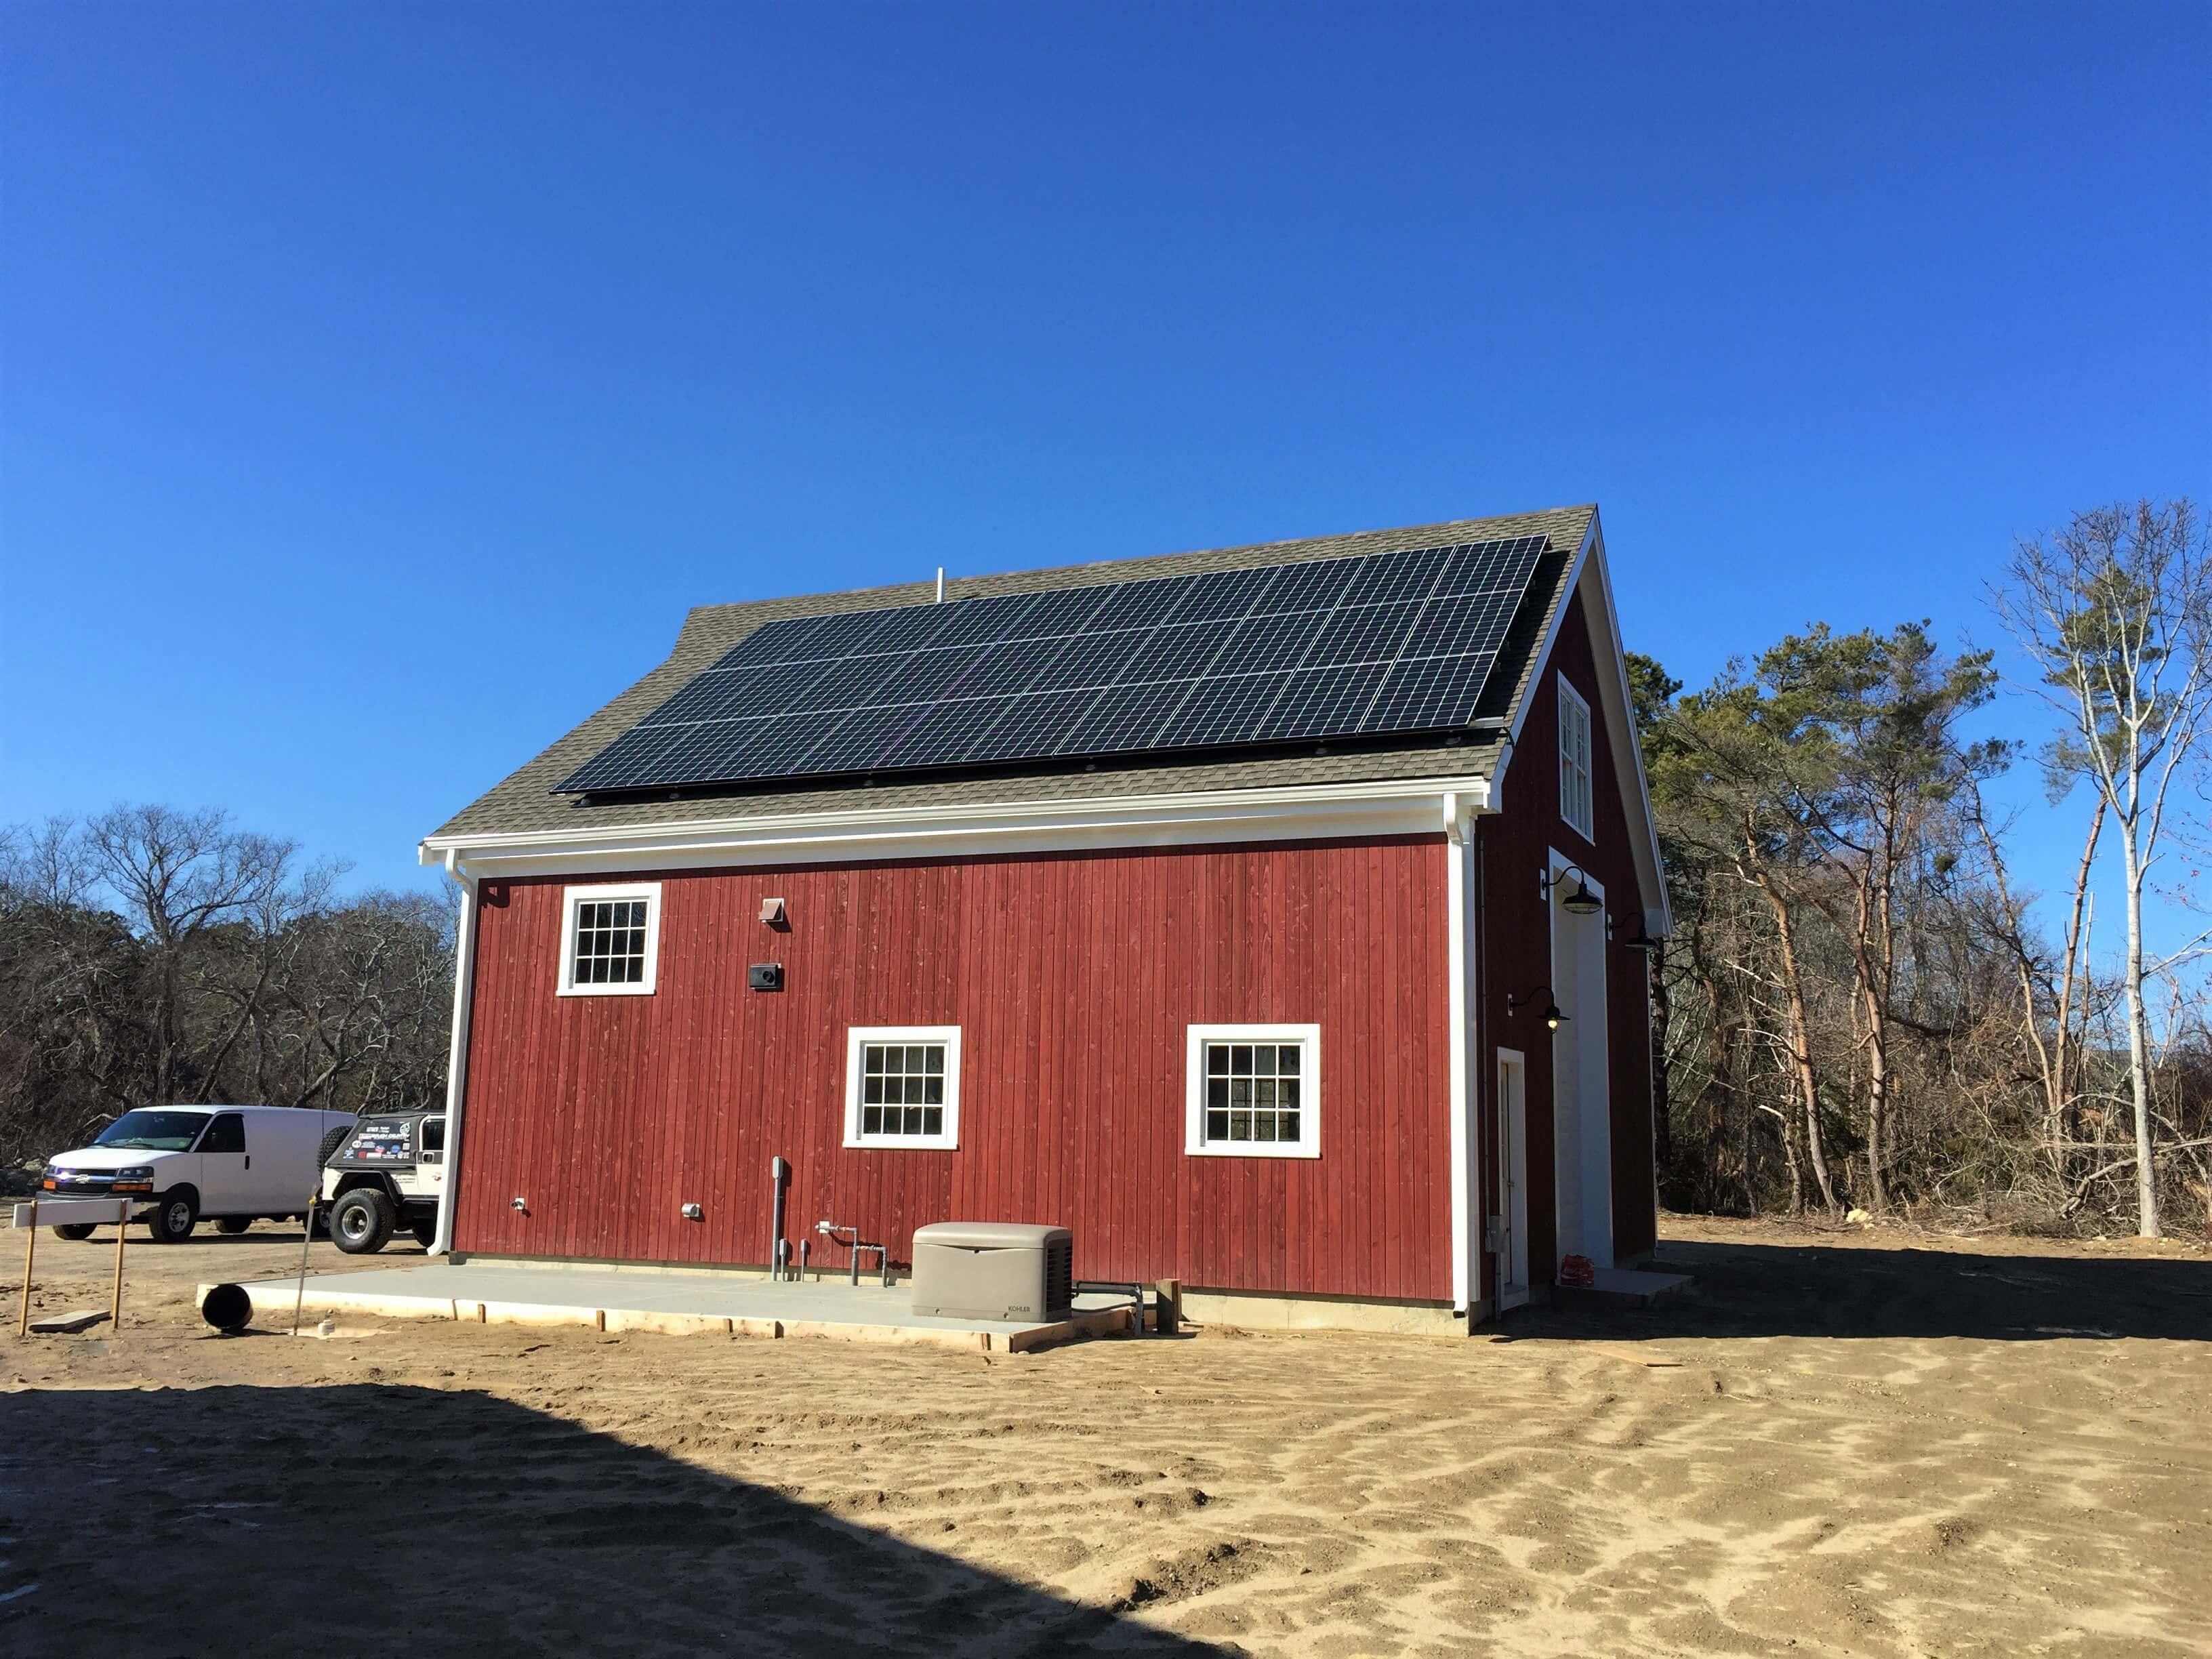 west barnstable ma cape cod solar installation